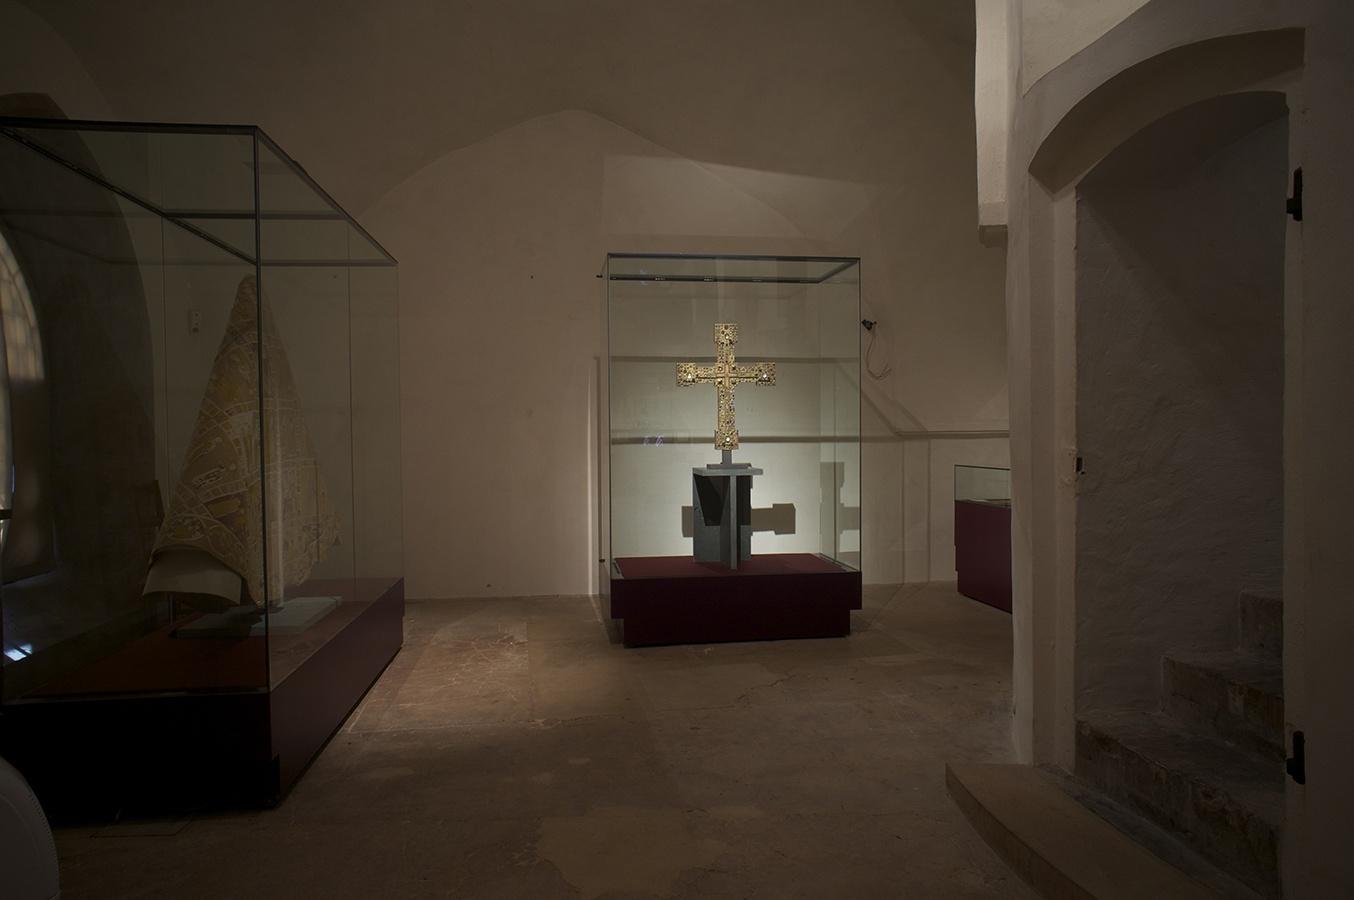 150808 1647 Gewandkapelle website